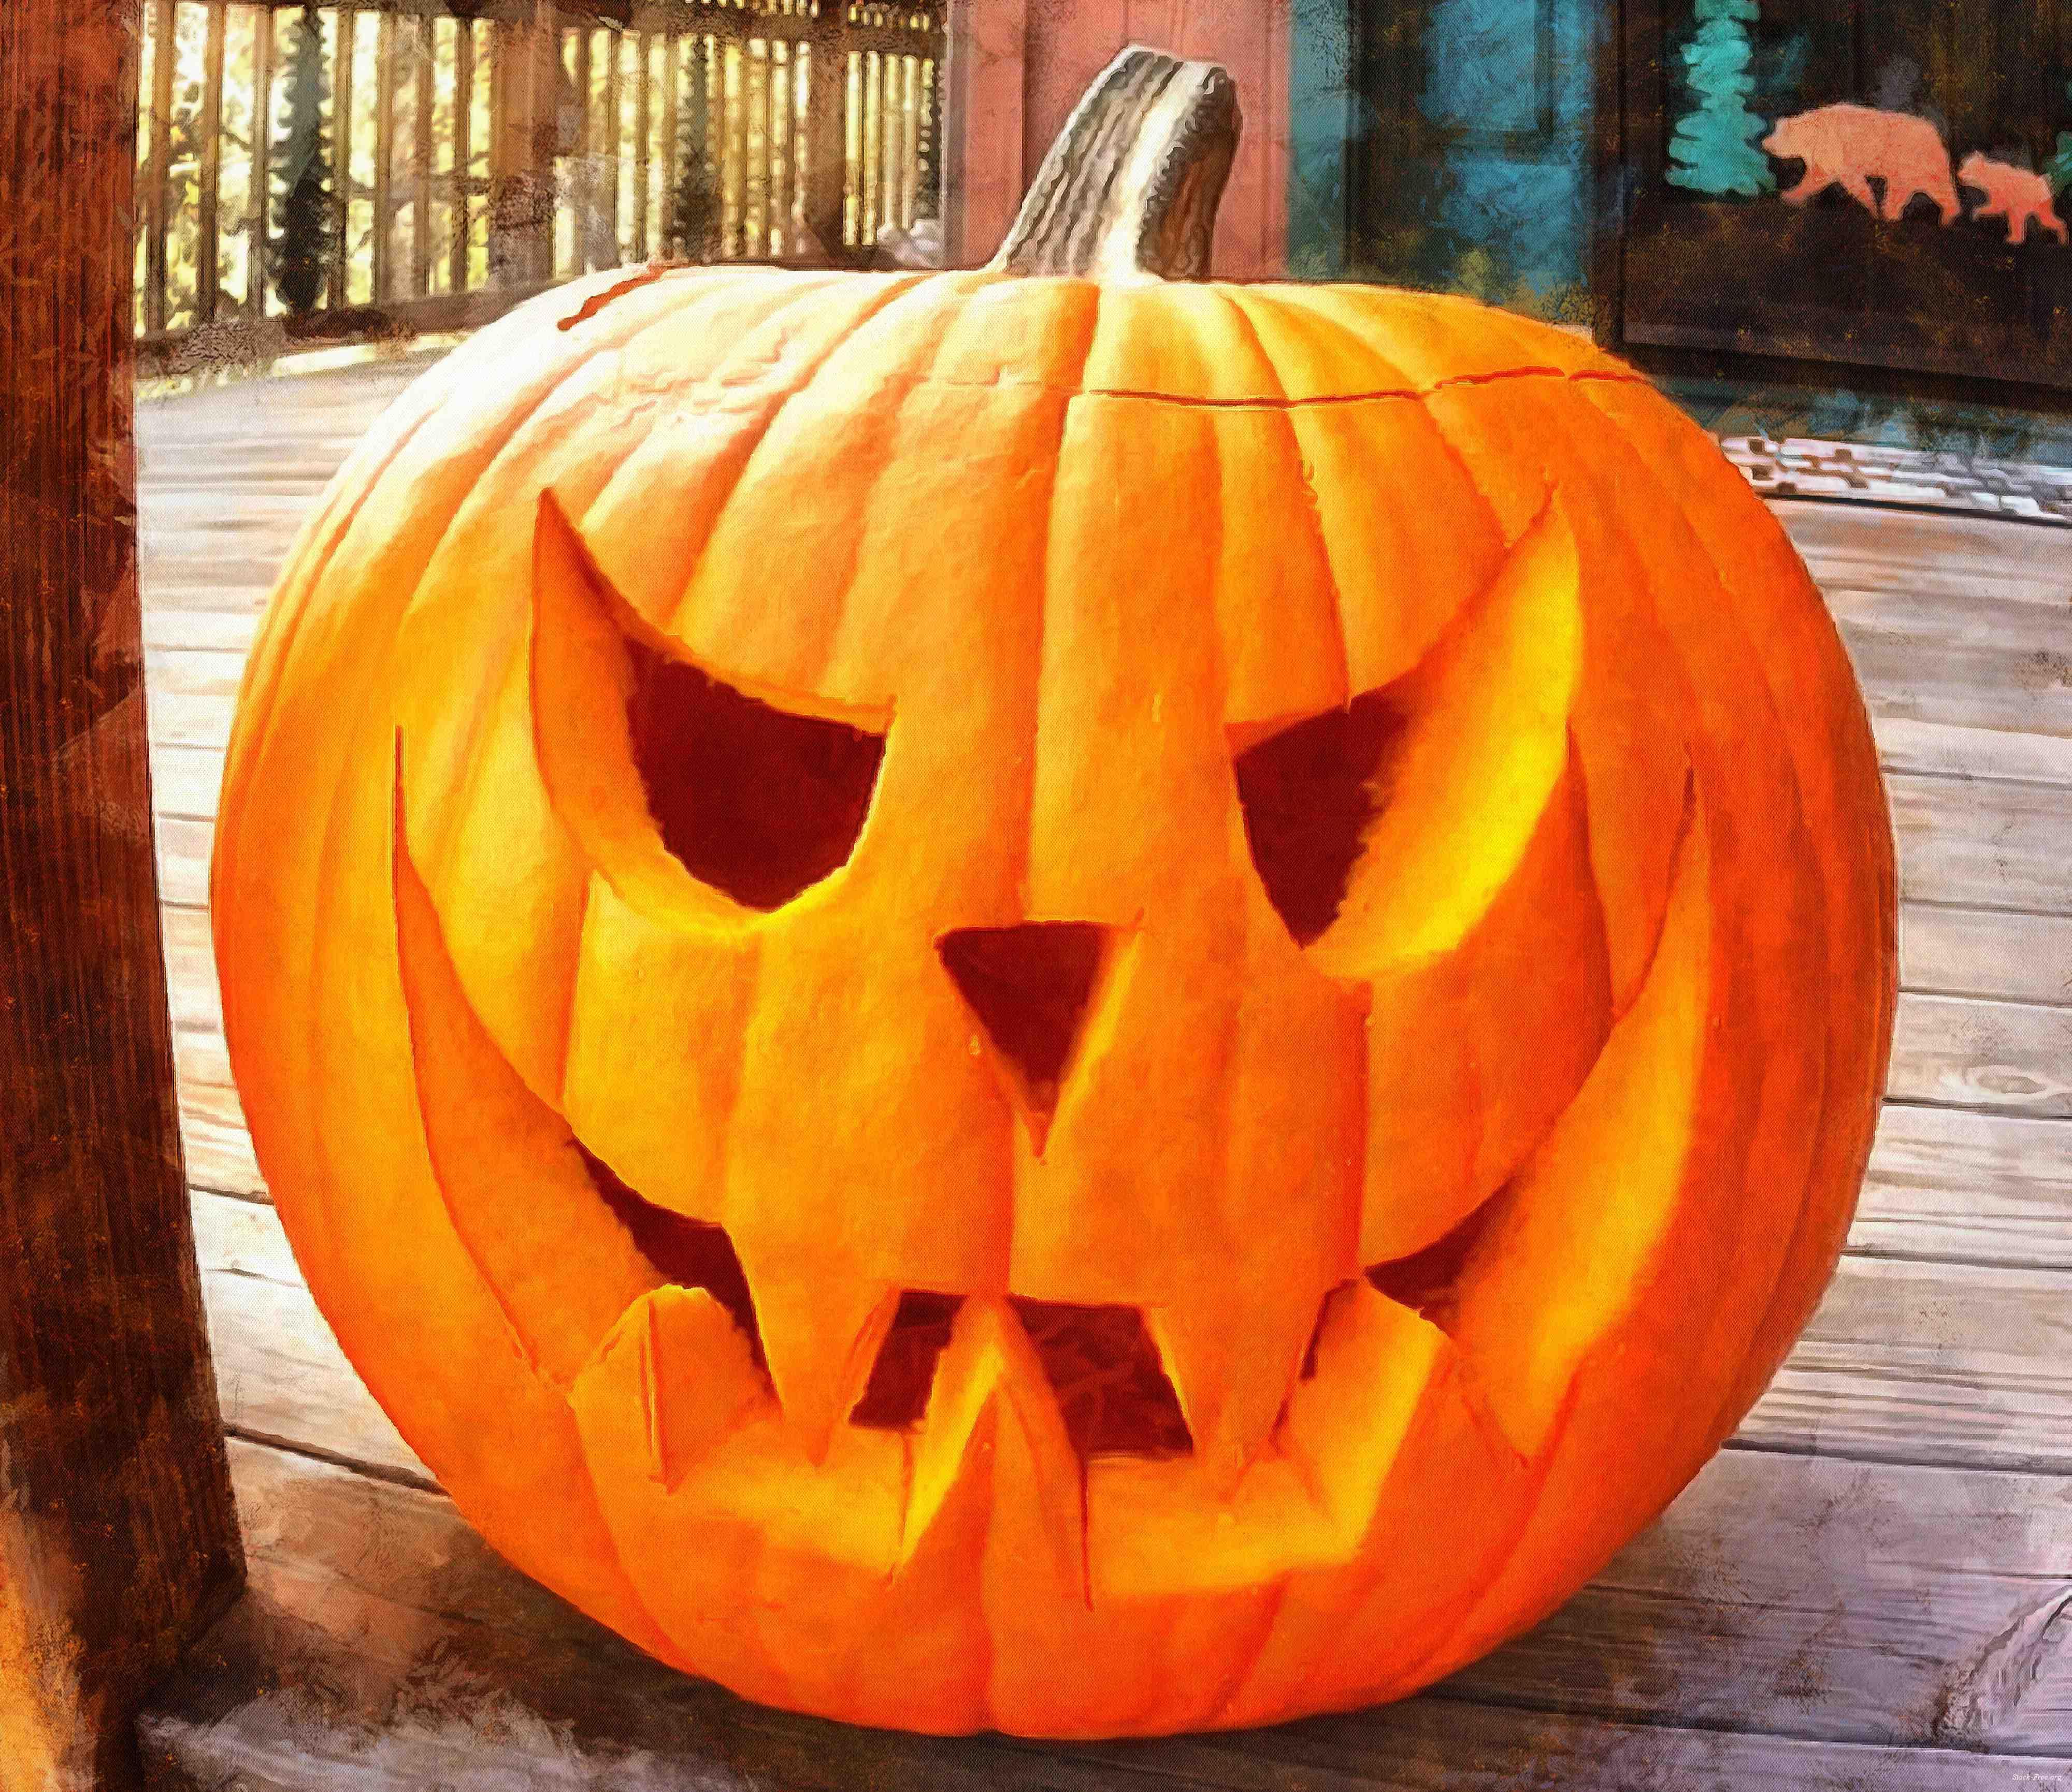 smile, light, candle, pumkin, pumpkins, holiday, smile, candle, Halloween pumpkin